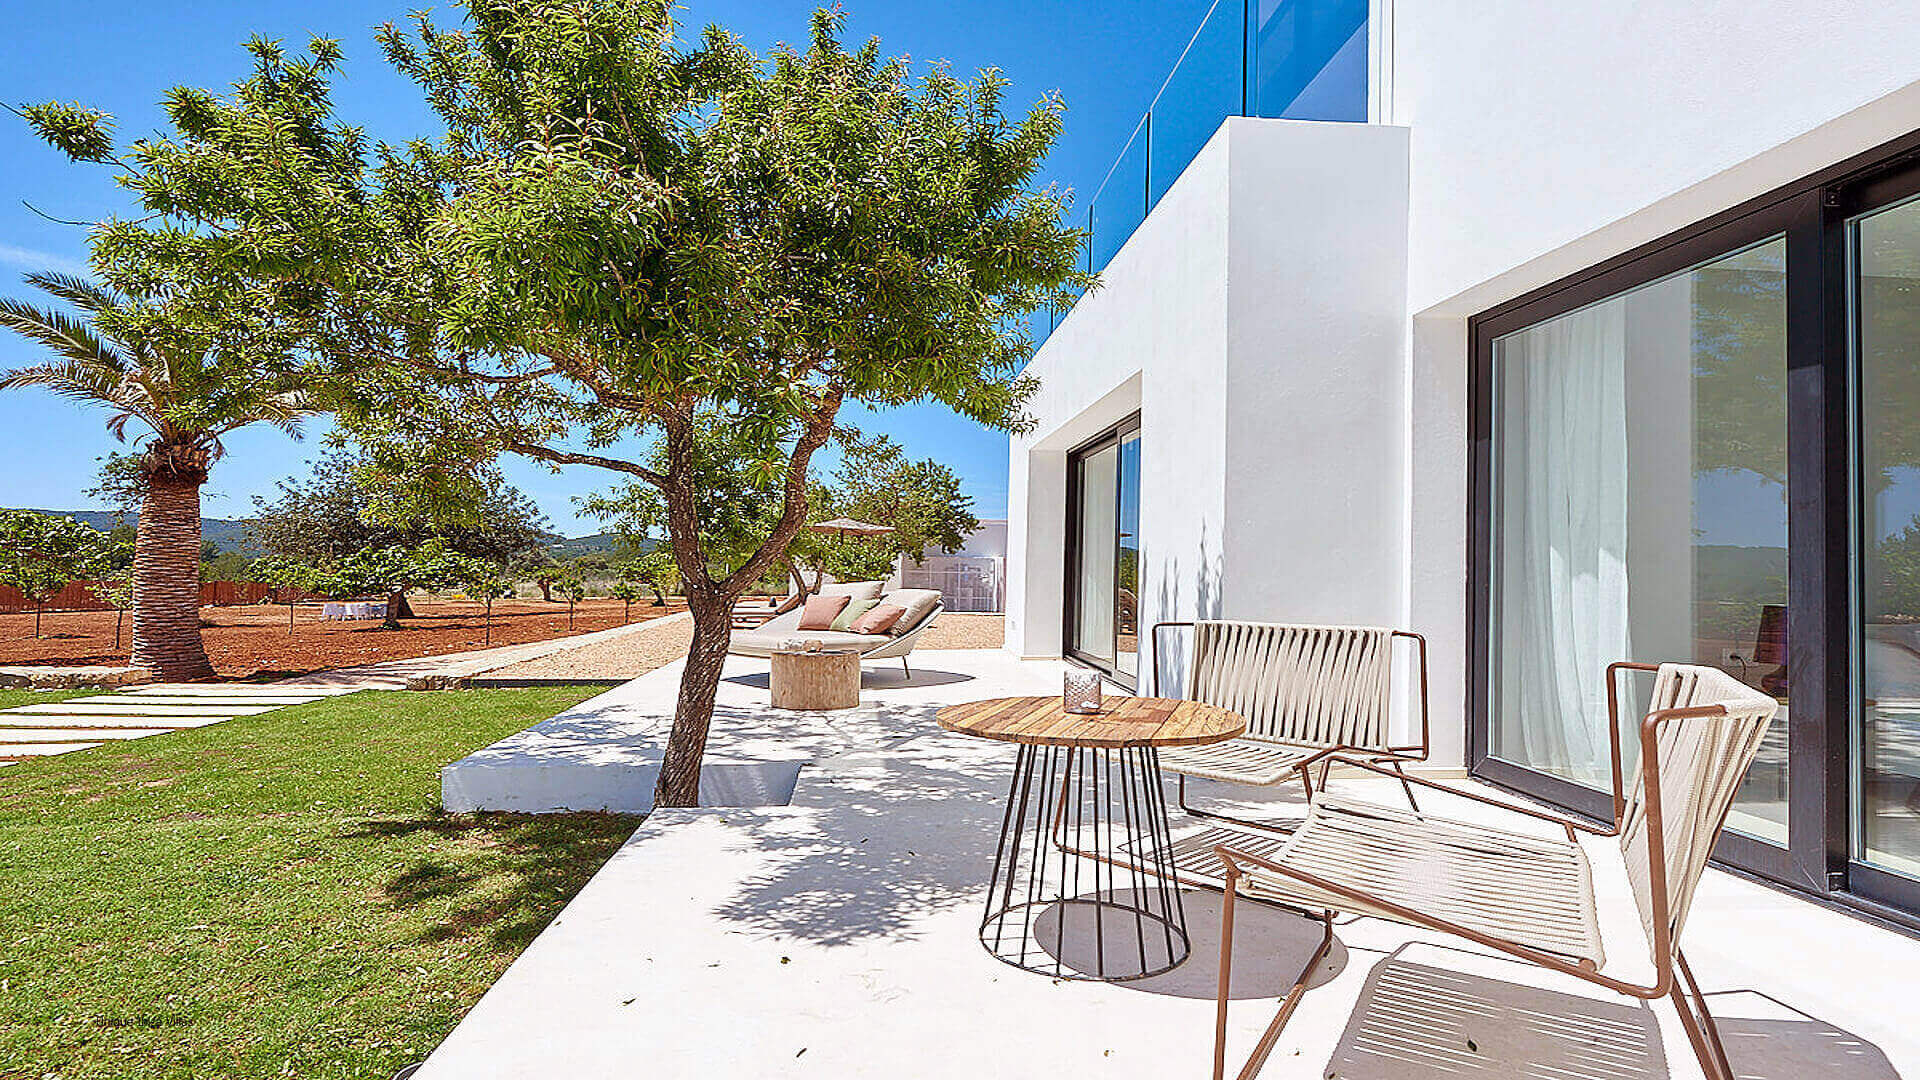 Villa Sa Gaita Ibiza 39 Bedroom 3 Terrace